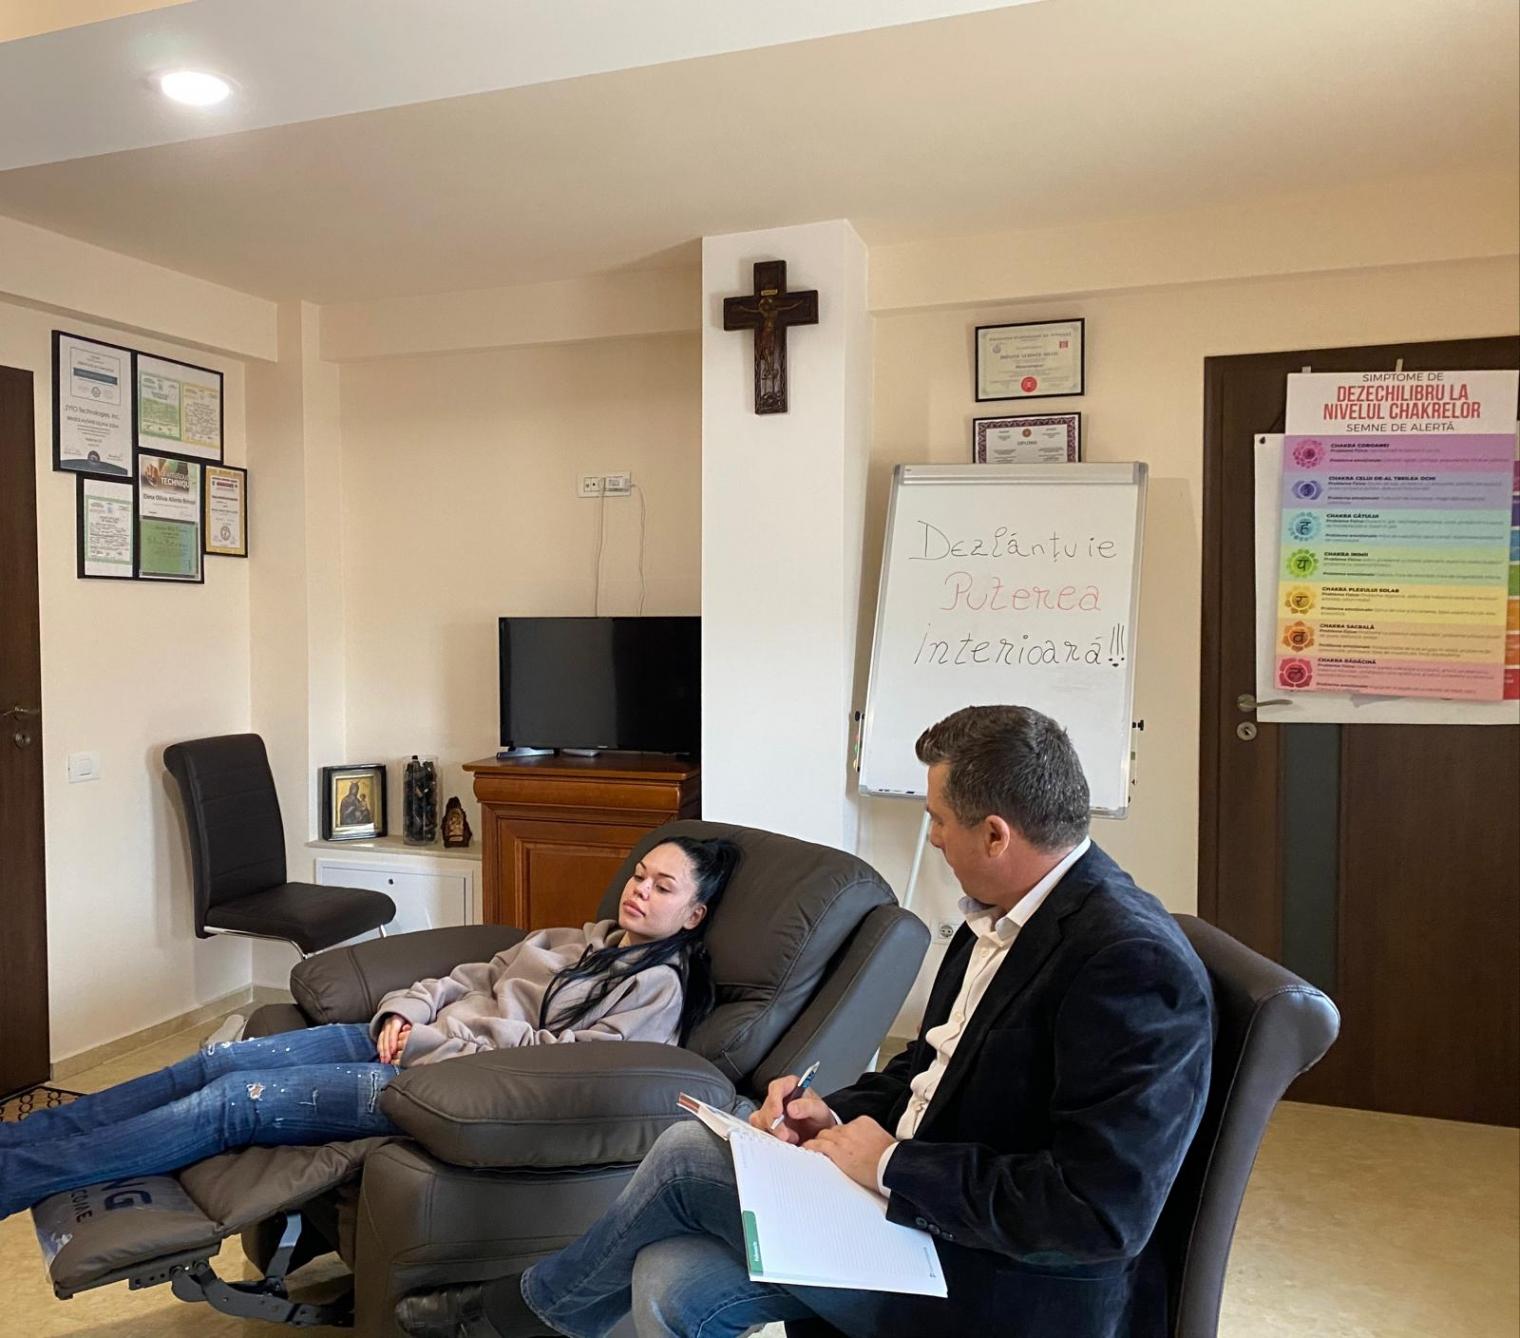 terapii alternative in afectiuni-hipnoterapie-terapeut brinzoi silviu